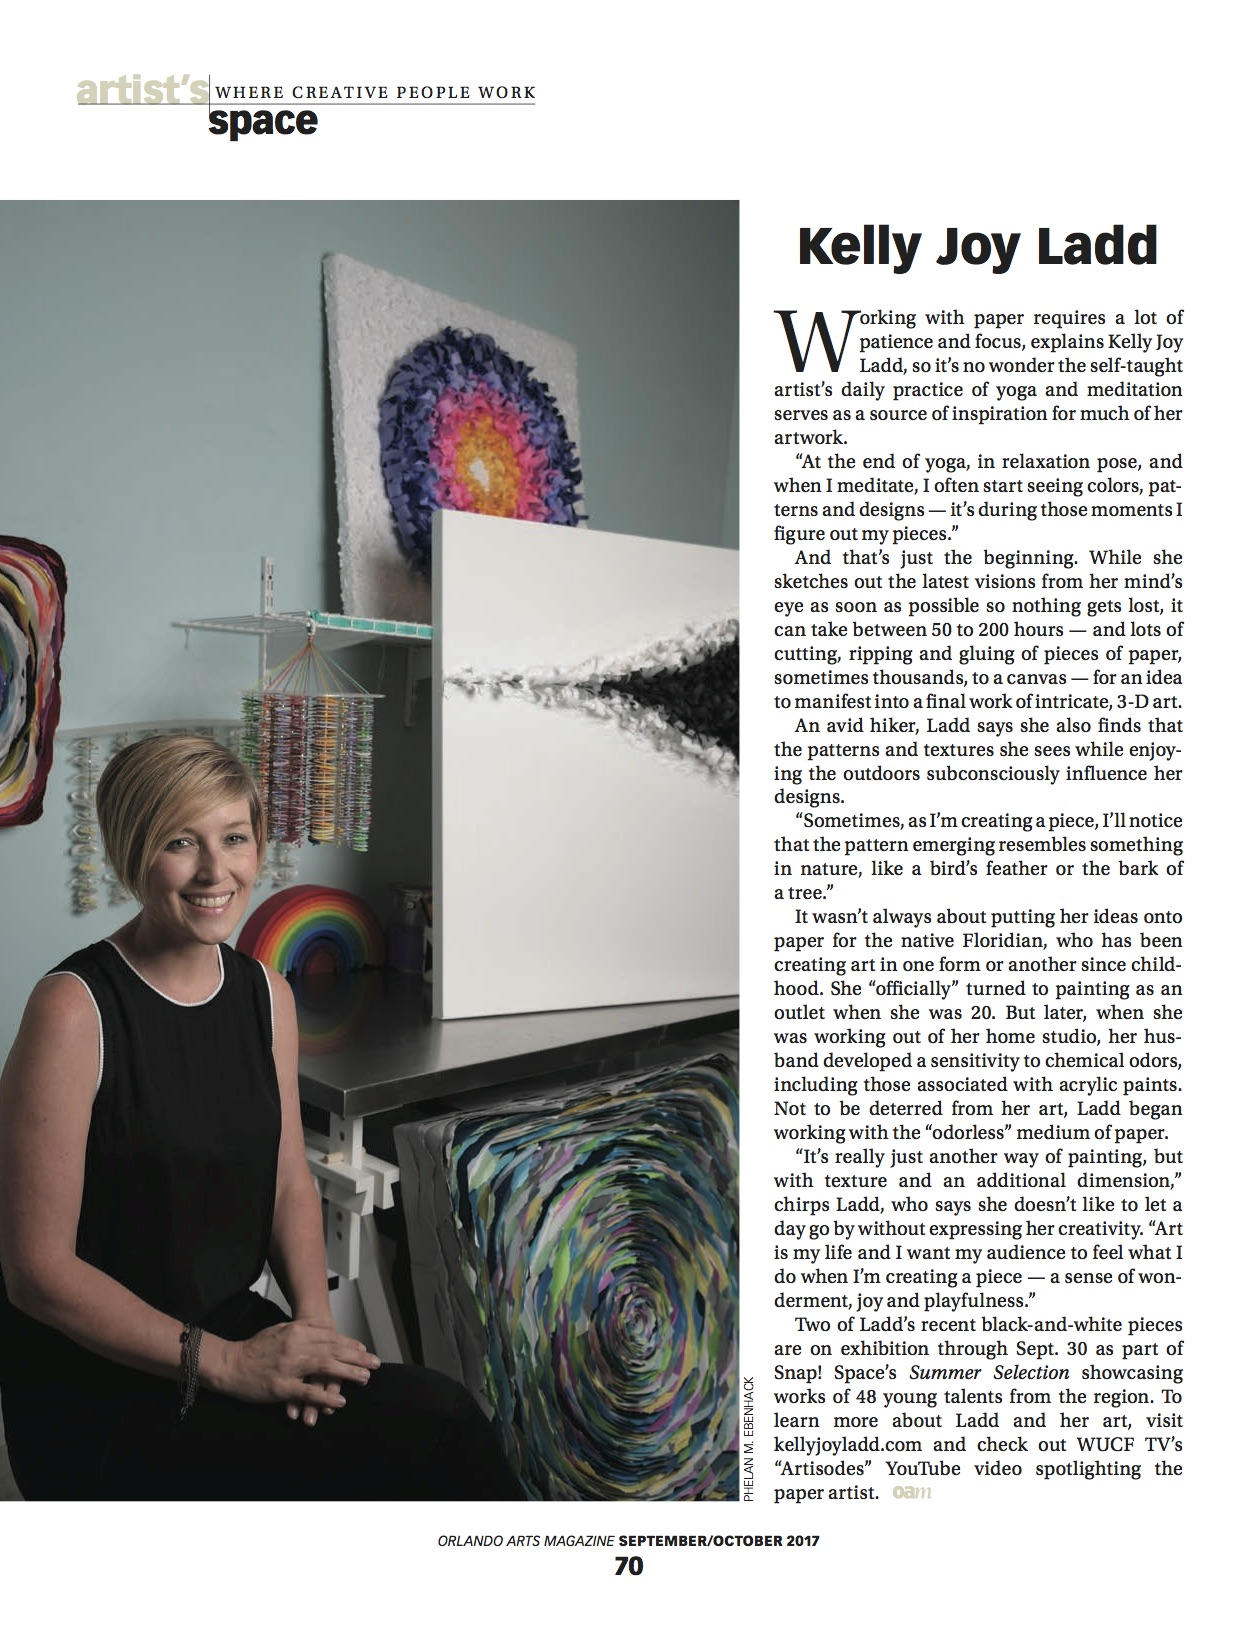 orlando art magazine; kellyjoyladd.com